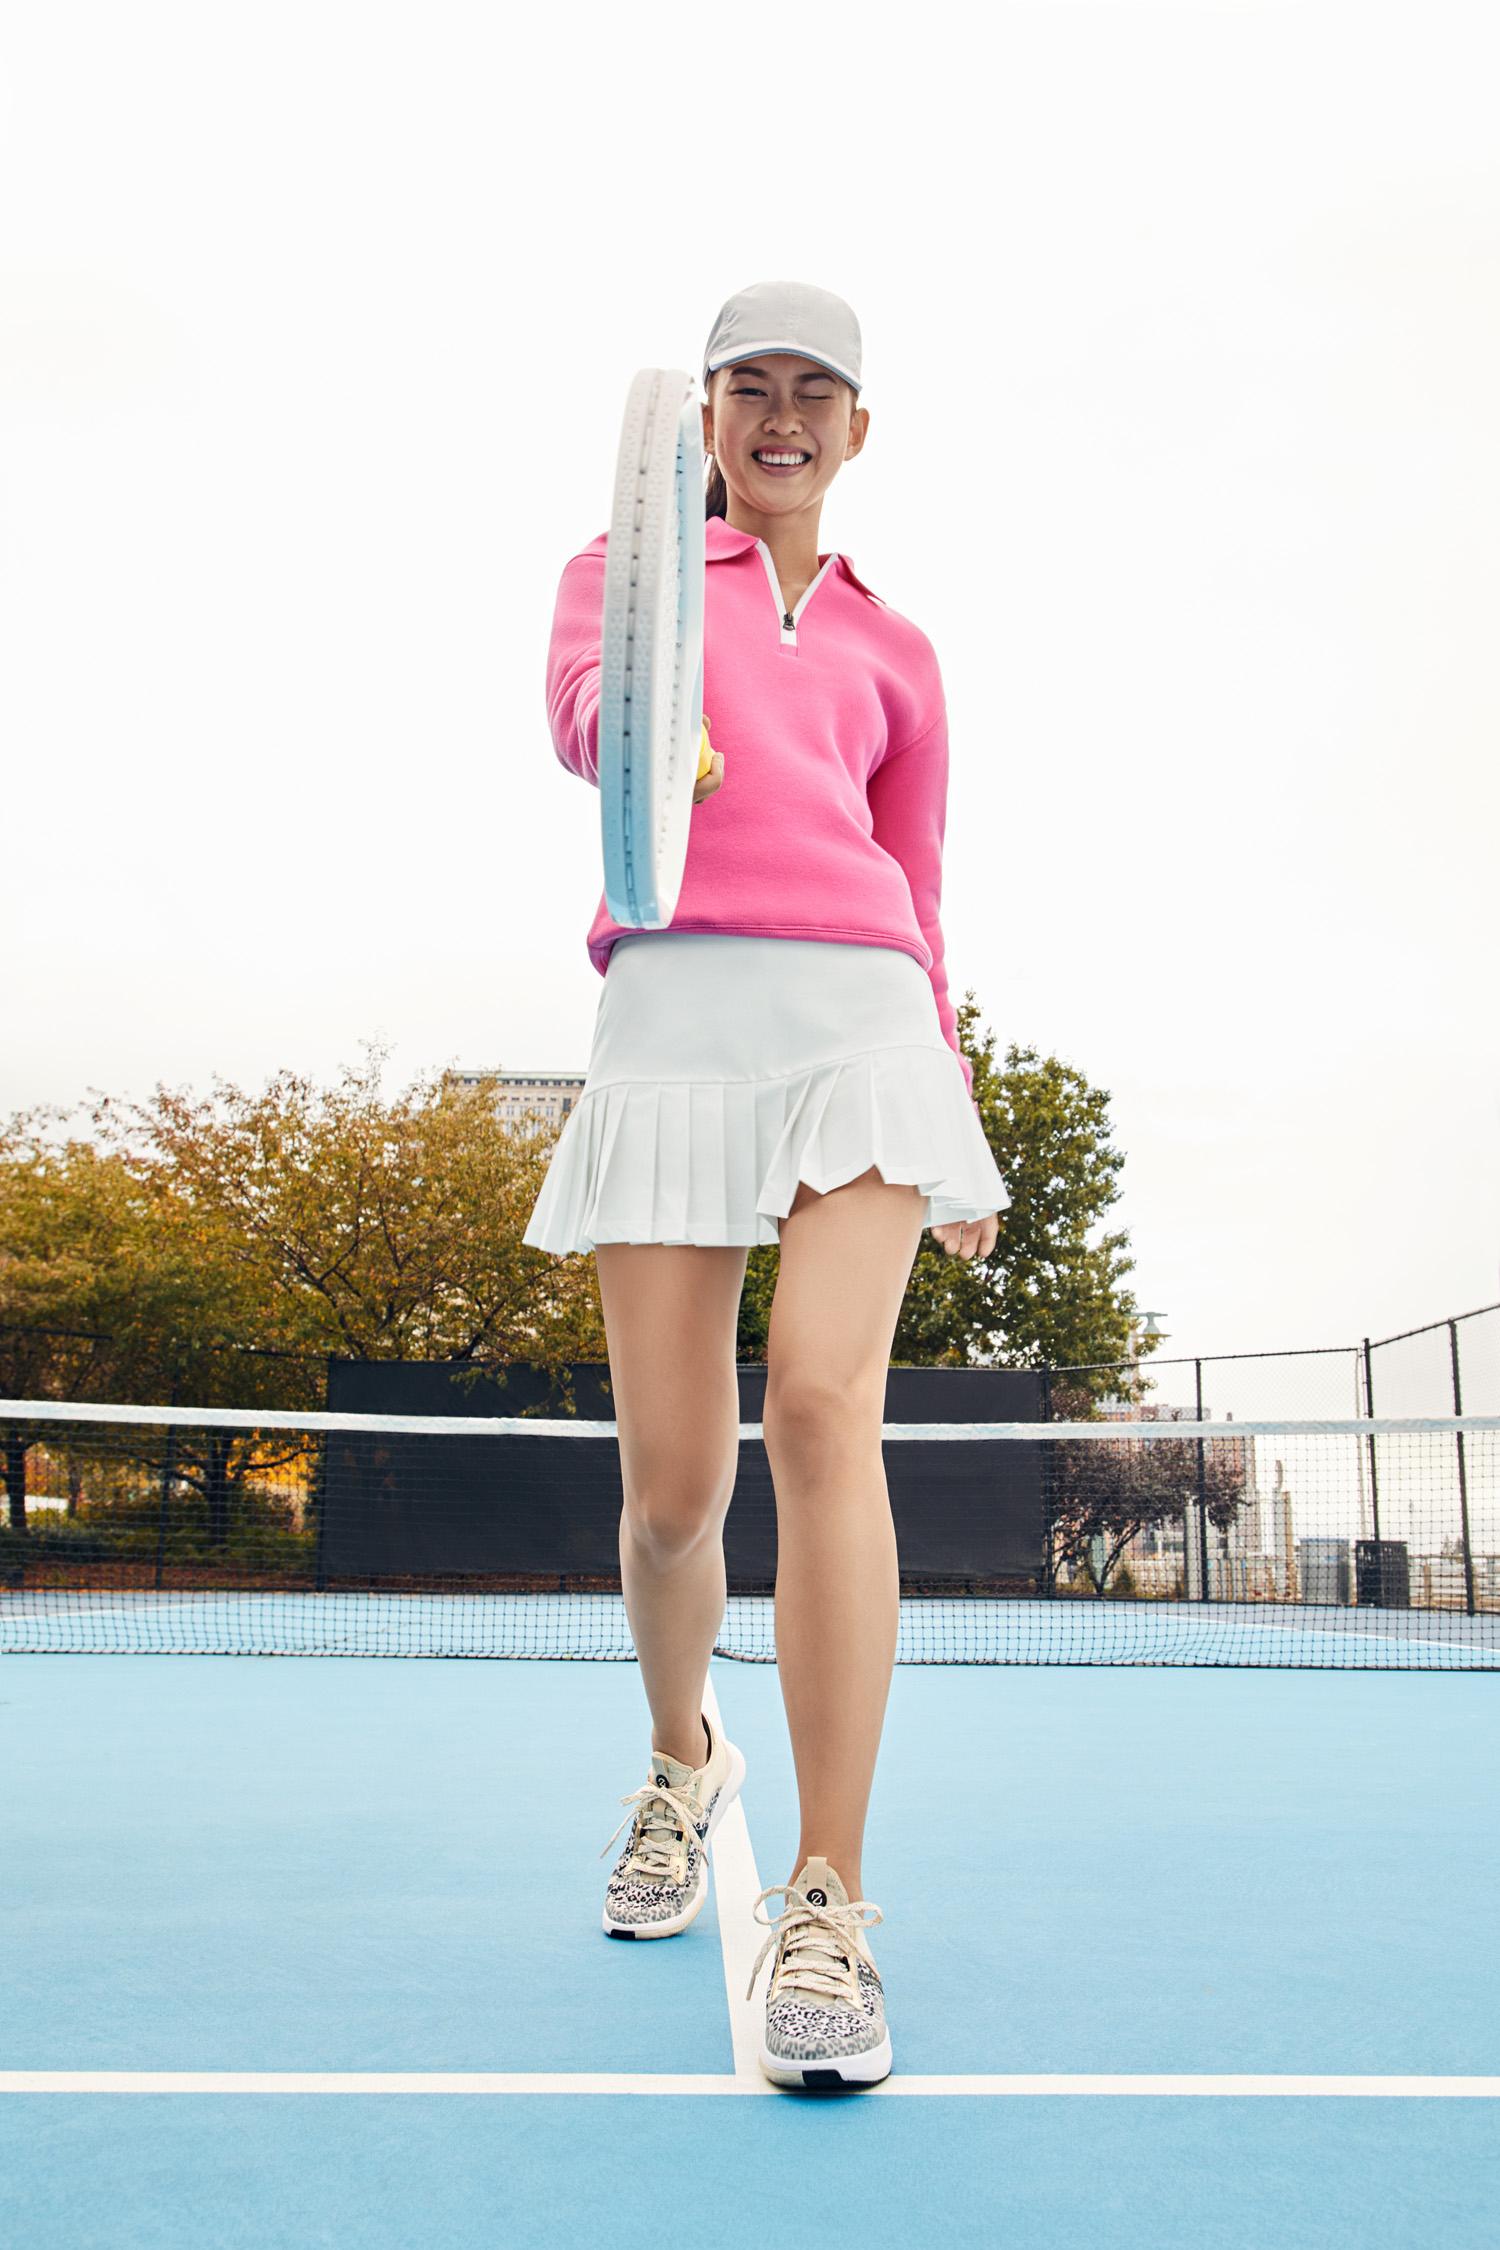 Cole Haan Women's ZERØGRAND Winner Tennis Sneaker in White Cap Grey, $130